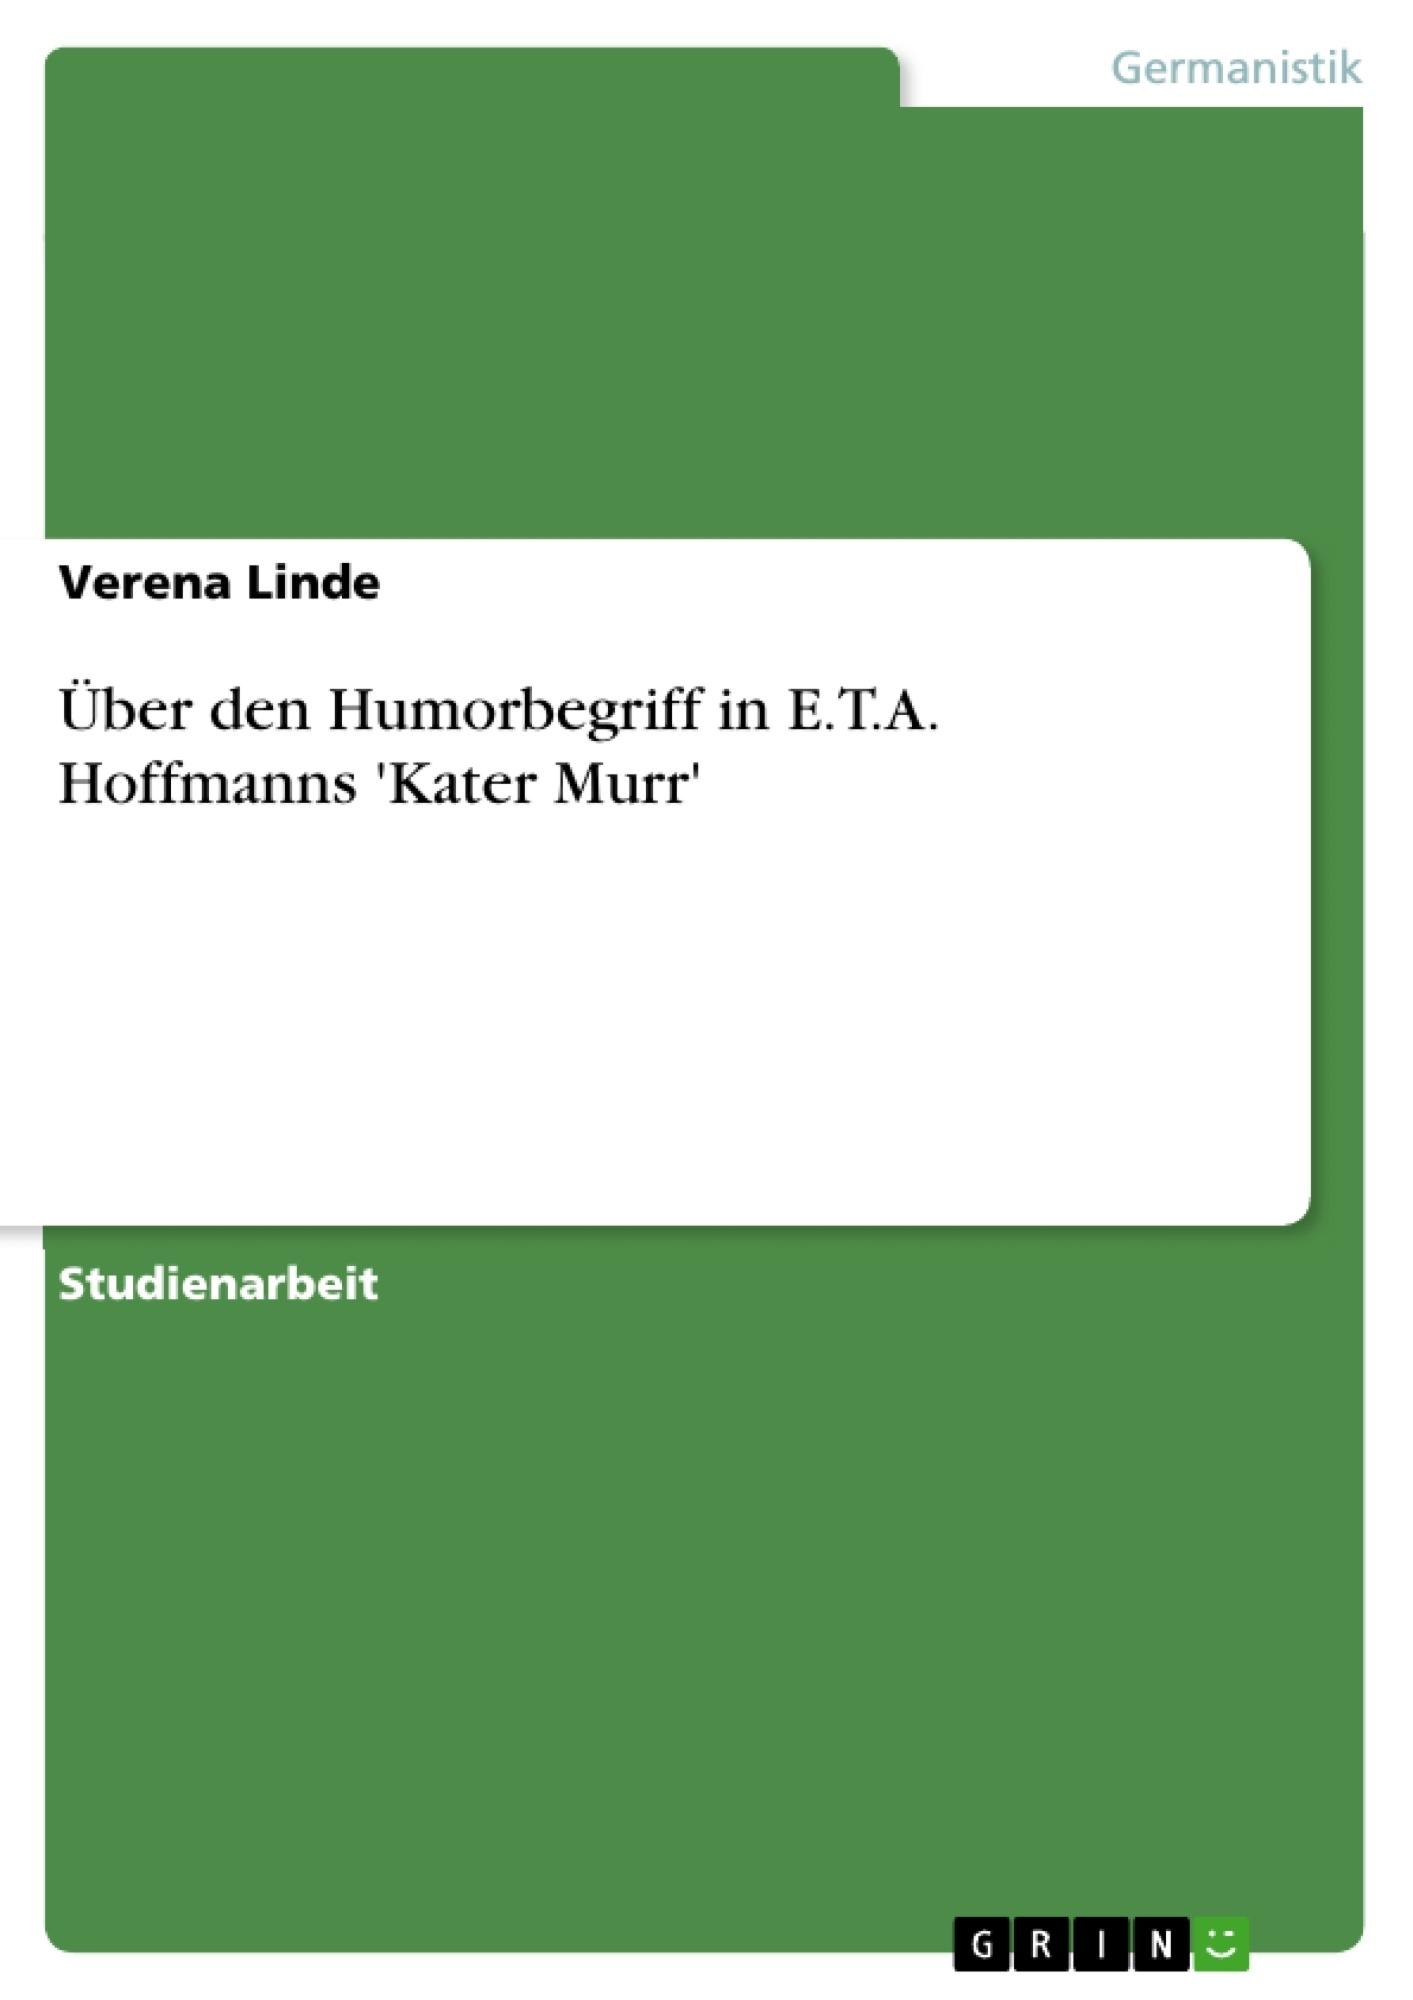 Titel: Über den Humorbegriff in E.T.A. Hoffmanns 'Kater Murr'